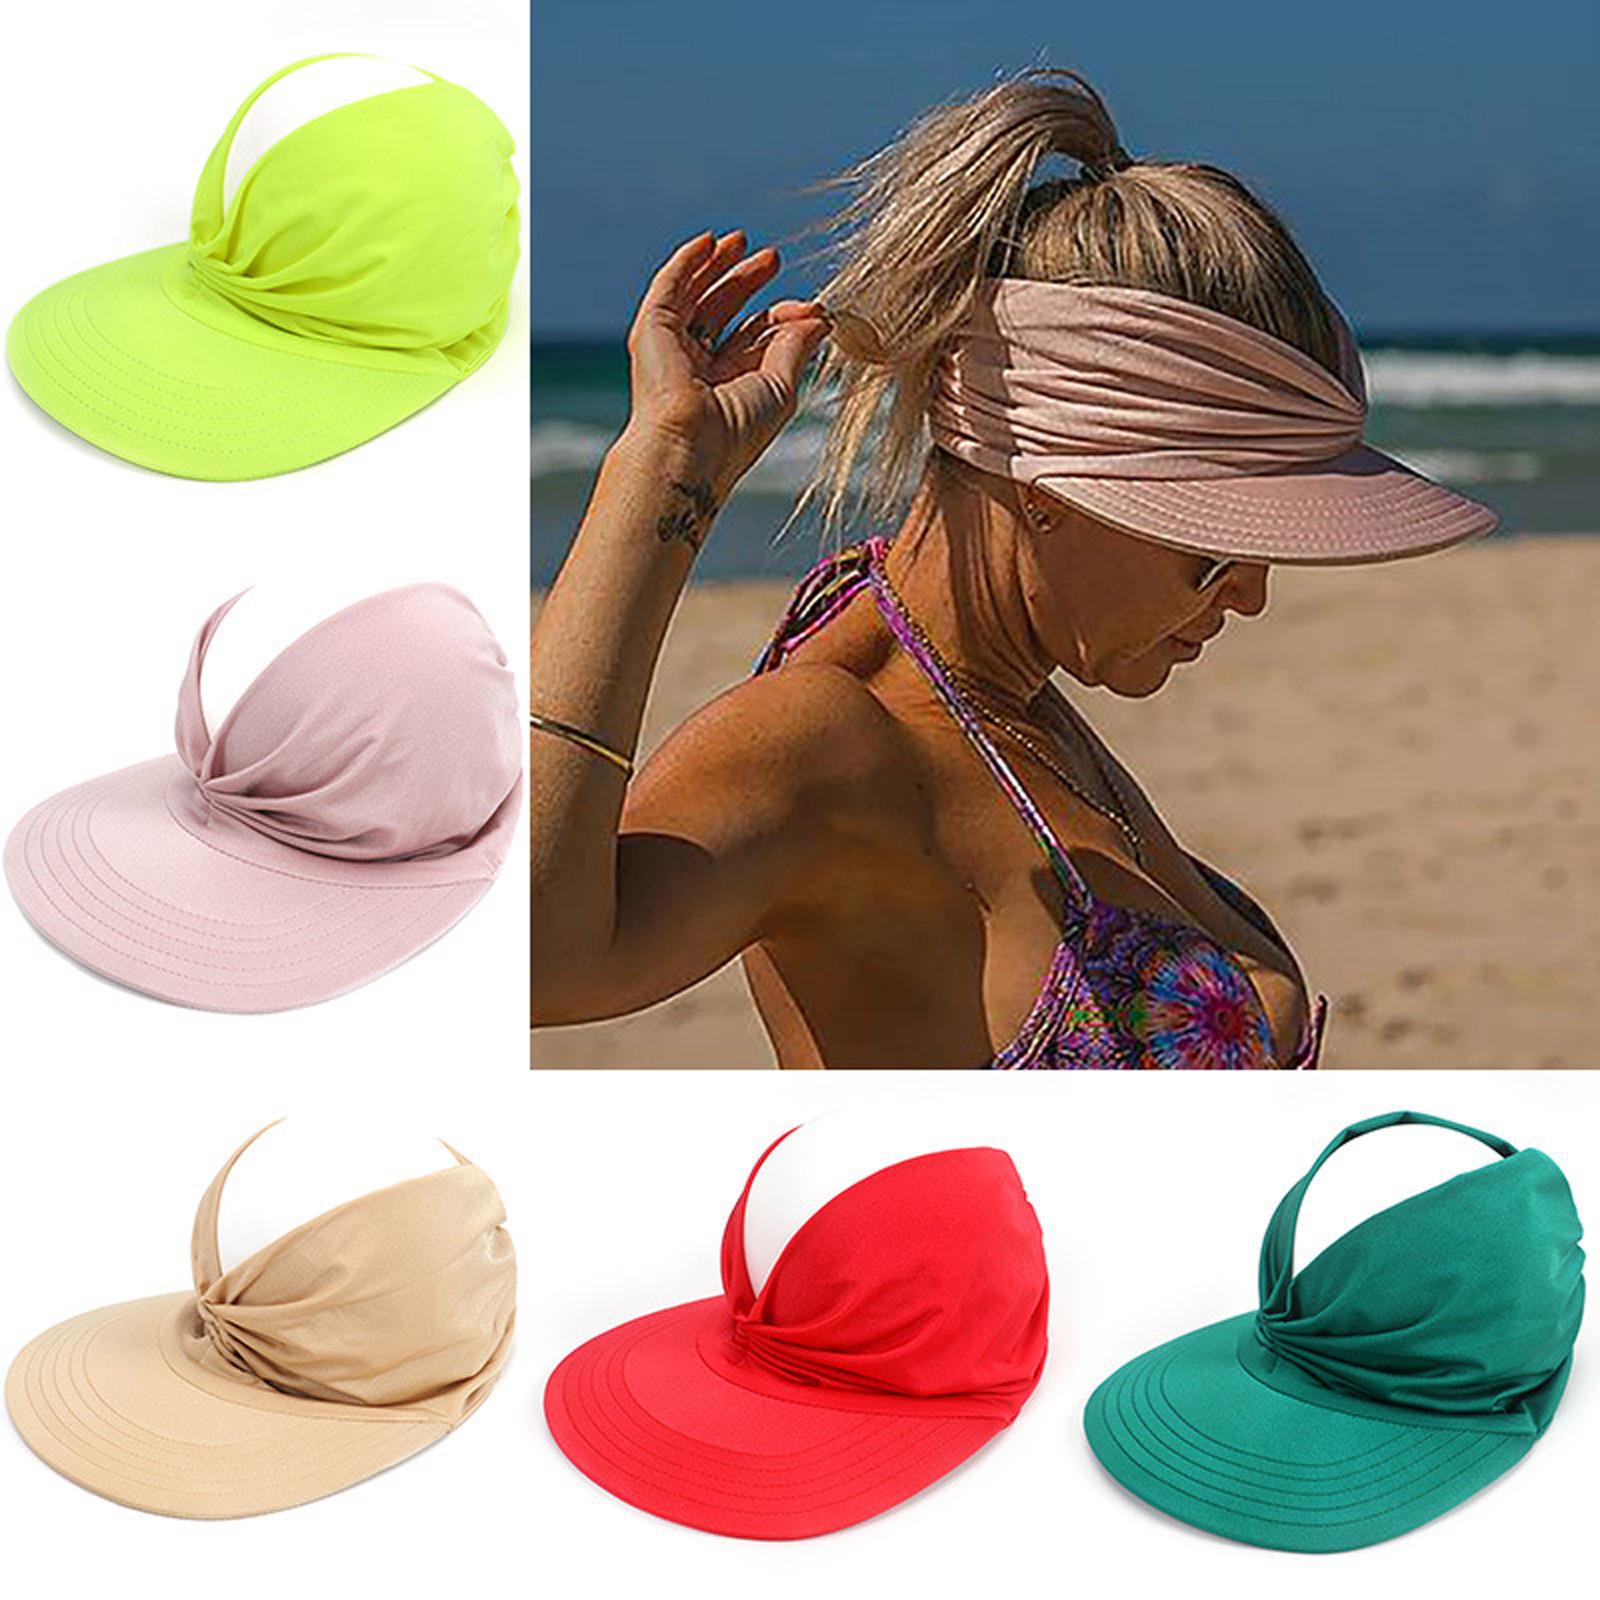 New Arrival Summer Hat Women's Sun Visor Sun Hat Anti ultraviolet Elastic Hollow Top Hat New Casual Caps Gorras